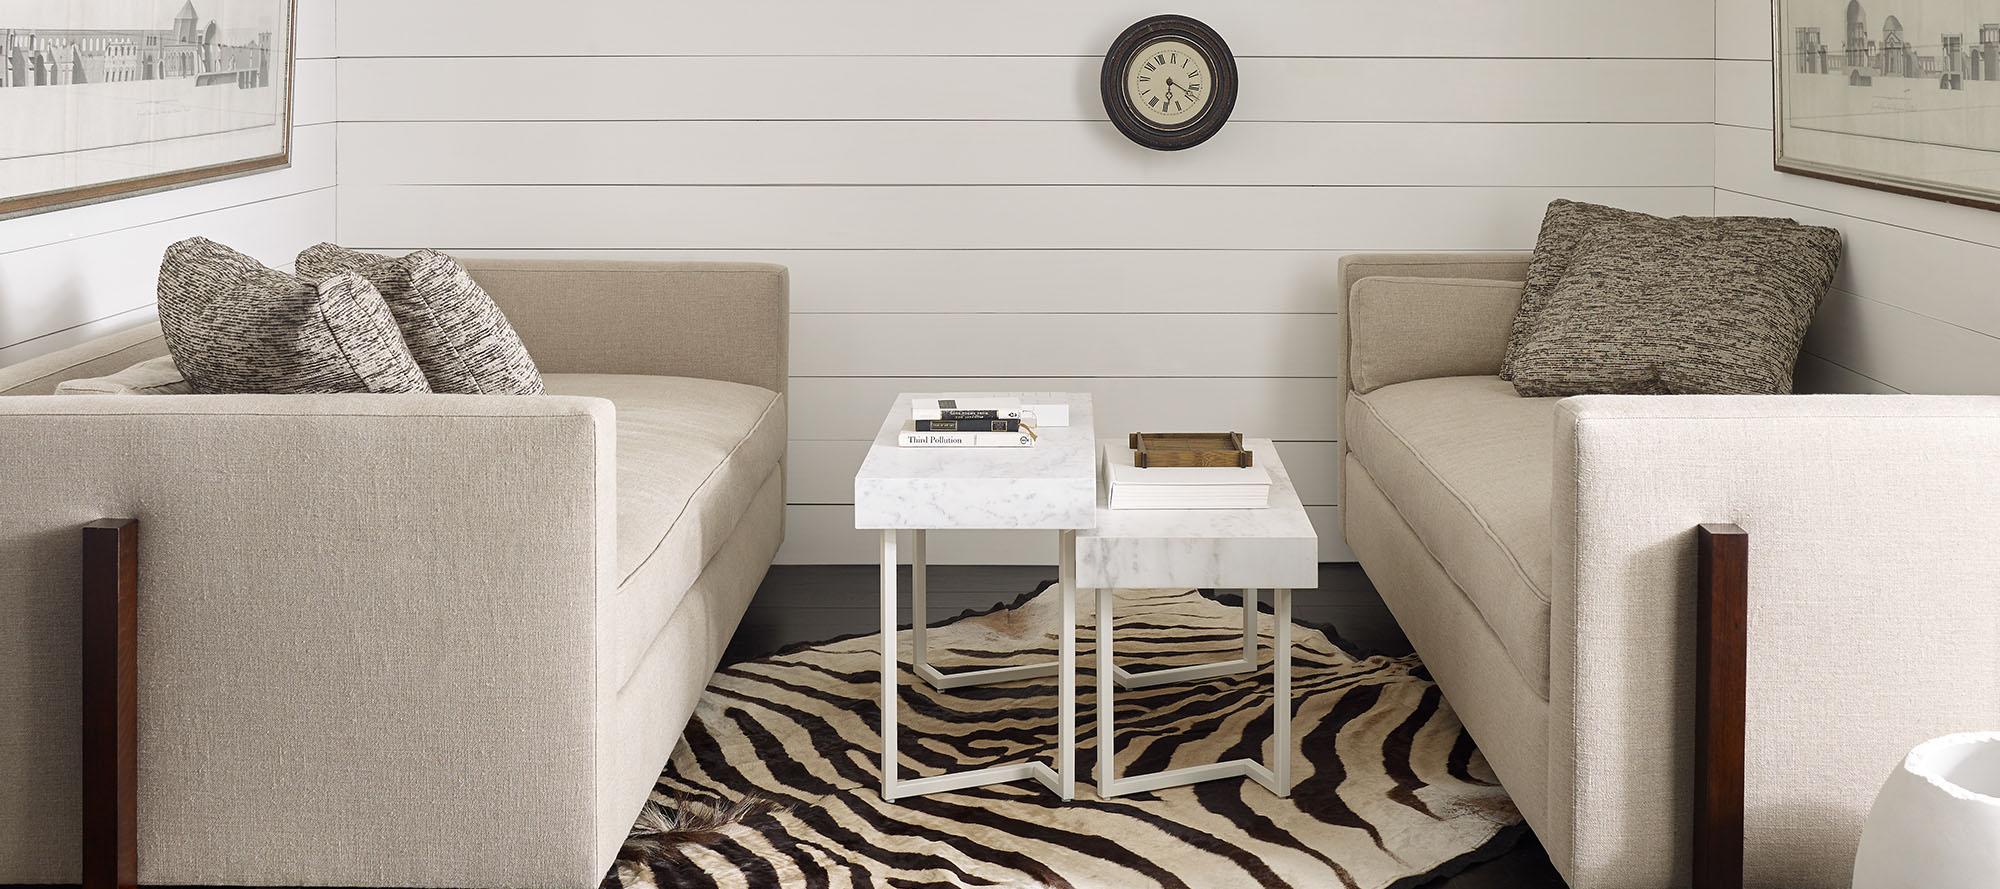 The darryl carter collection baker furniture for Darryl carter furniture collection